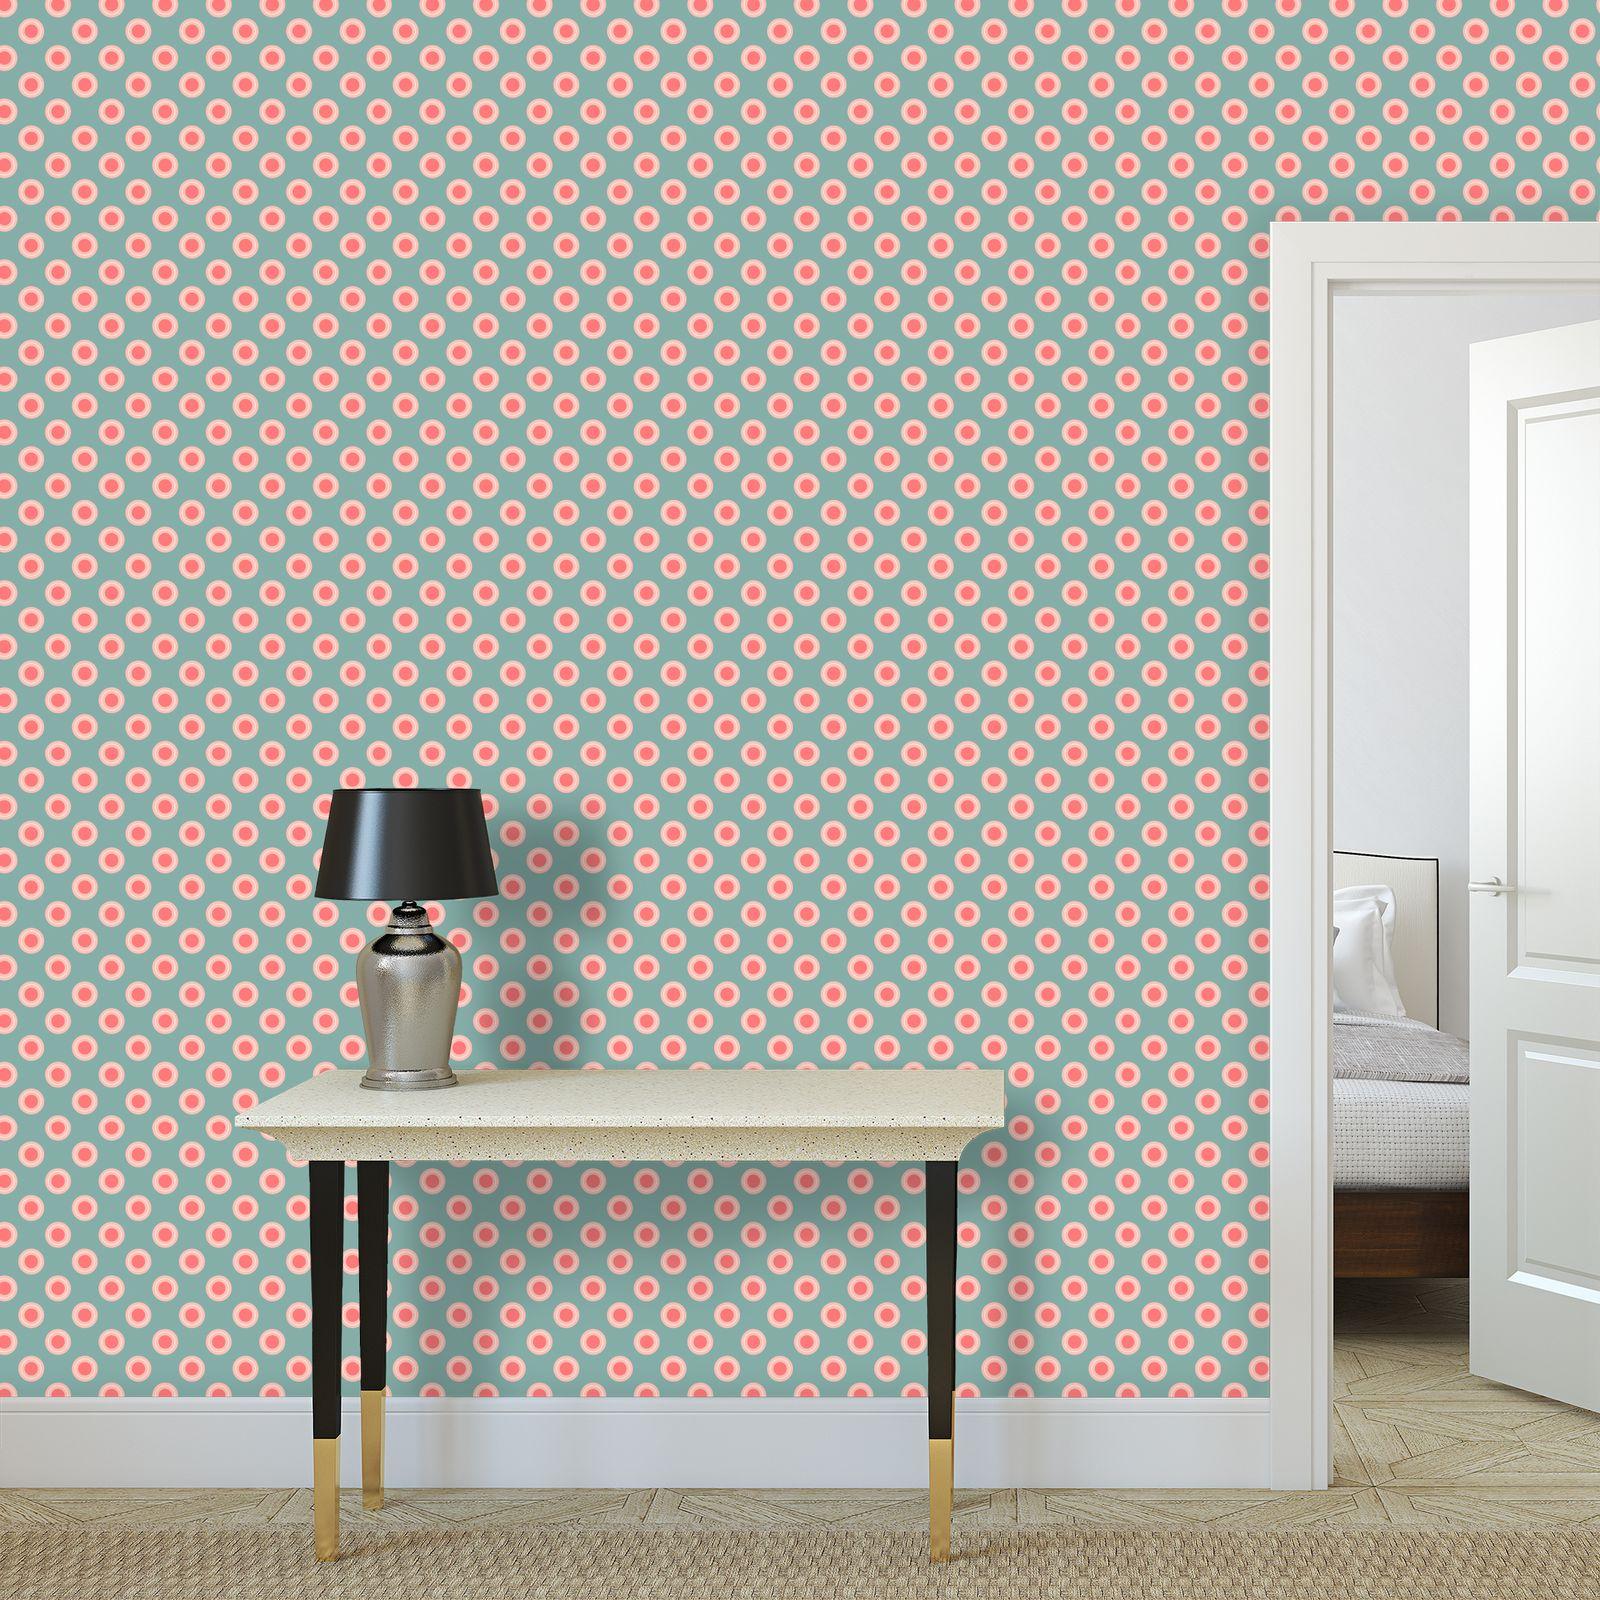 Strawberry meadow - Wallpaper Rolls - kids room pink green baby nursery, children polka dots